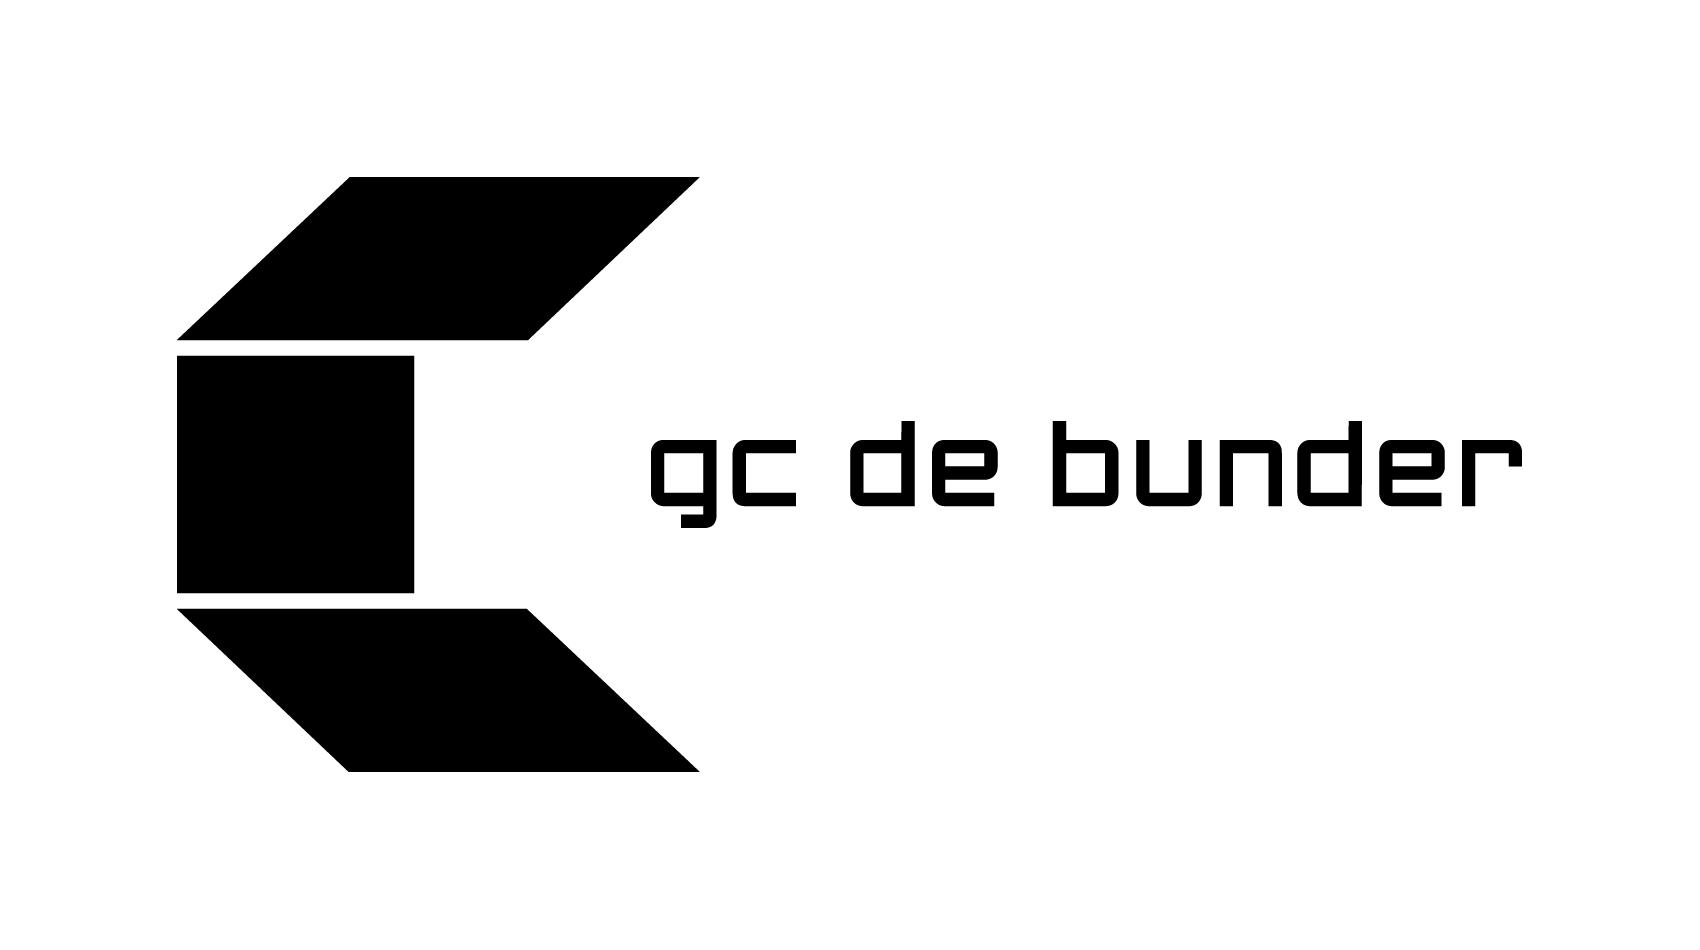 Moorslede GC De Bunder logo